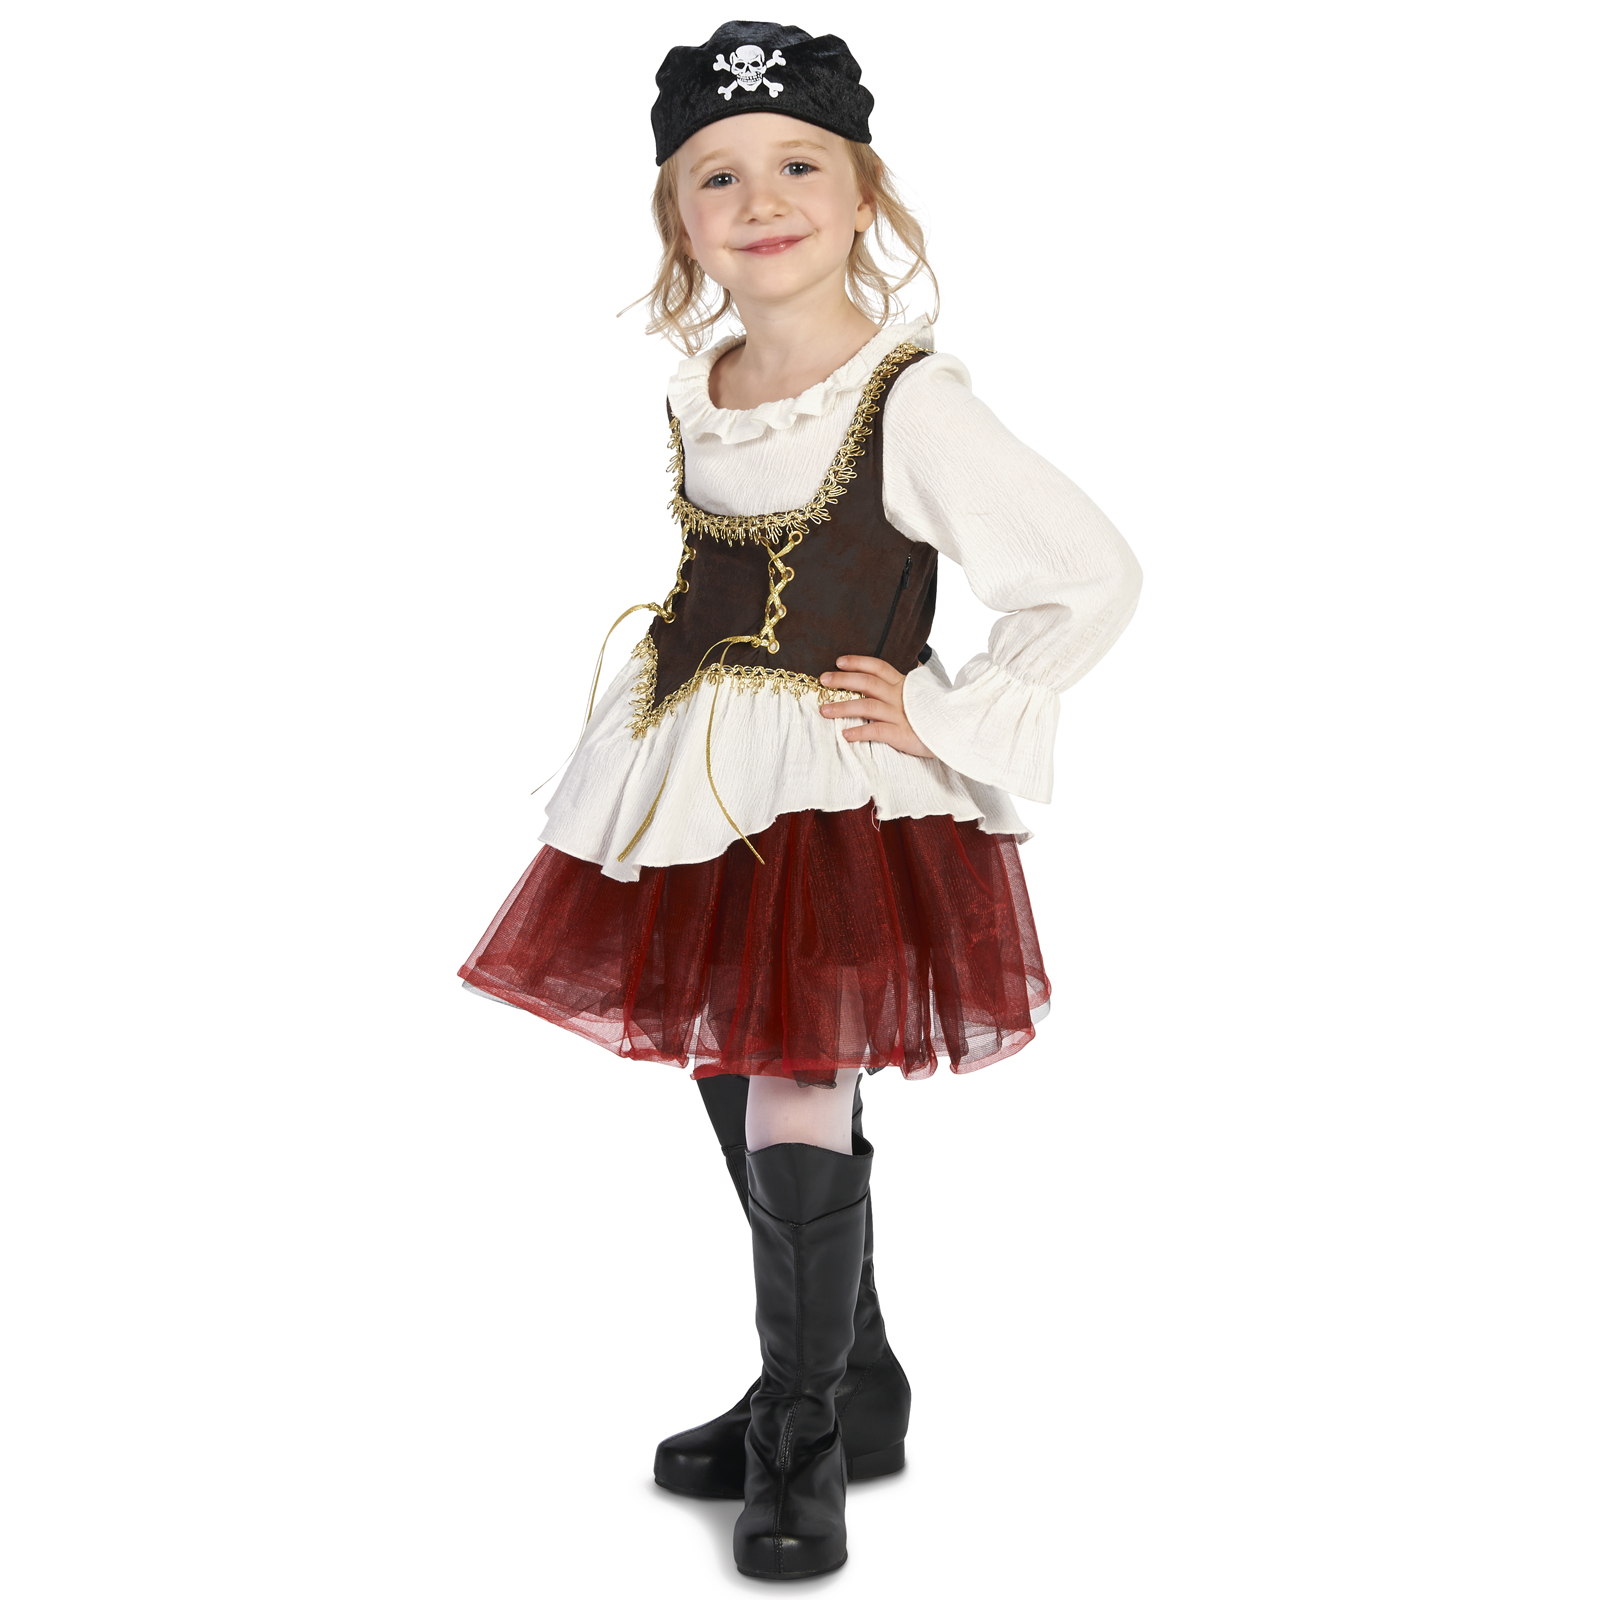 Pirate Tutu Girl Child Costume M (8-10) with Matching 18